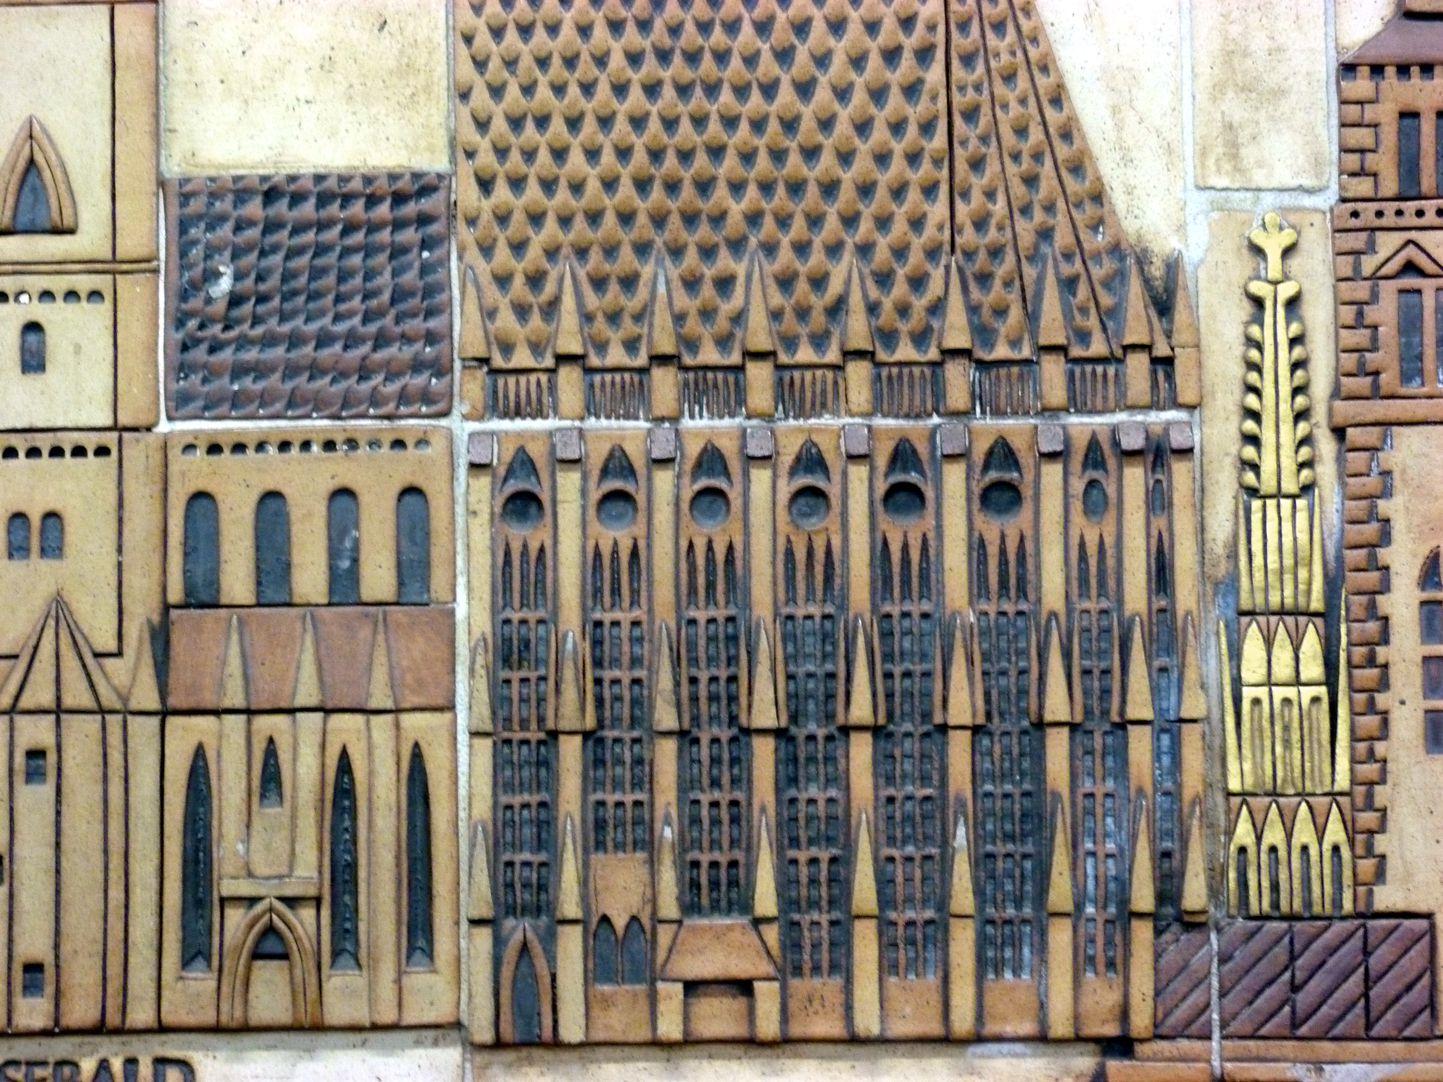 Keramikrelief der Nürnberger Altstadt Detail, Sebalder Chor